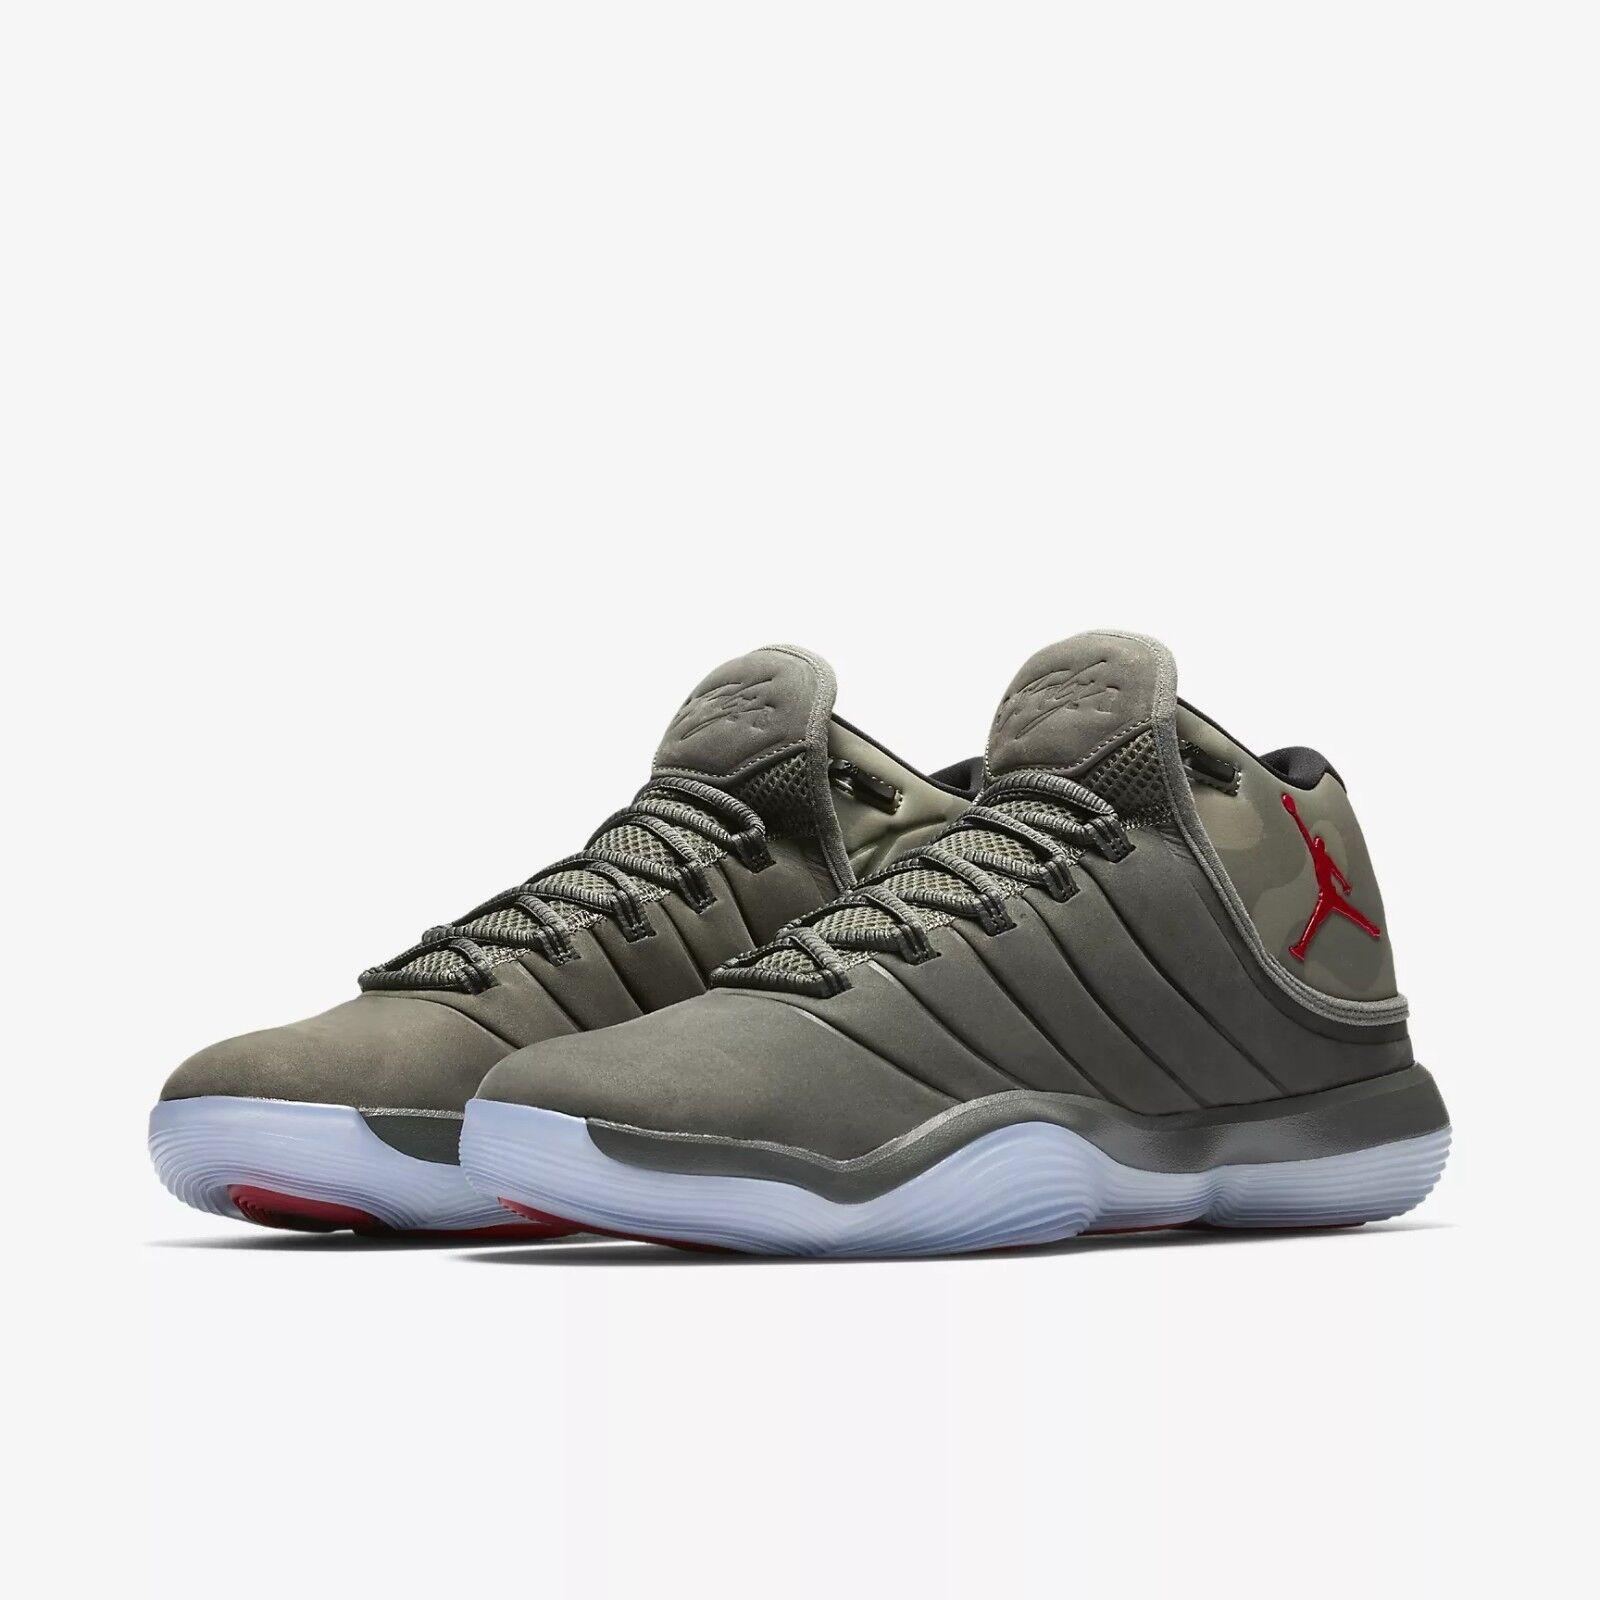 921203-051 Jordan Super.Fly 2017 Basketball Shoes River Rock/Blk Sizes 8-12 NIB